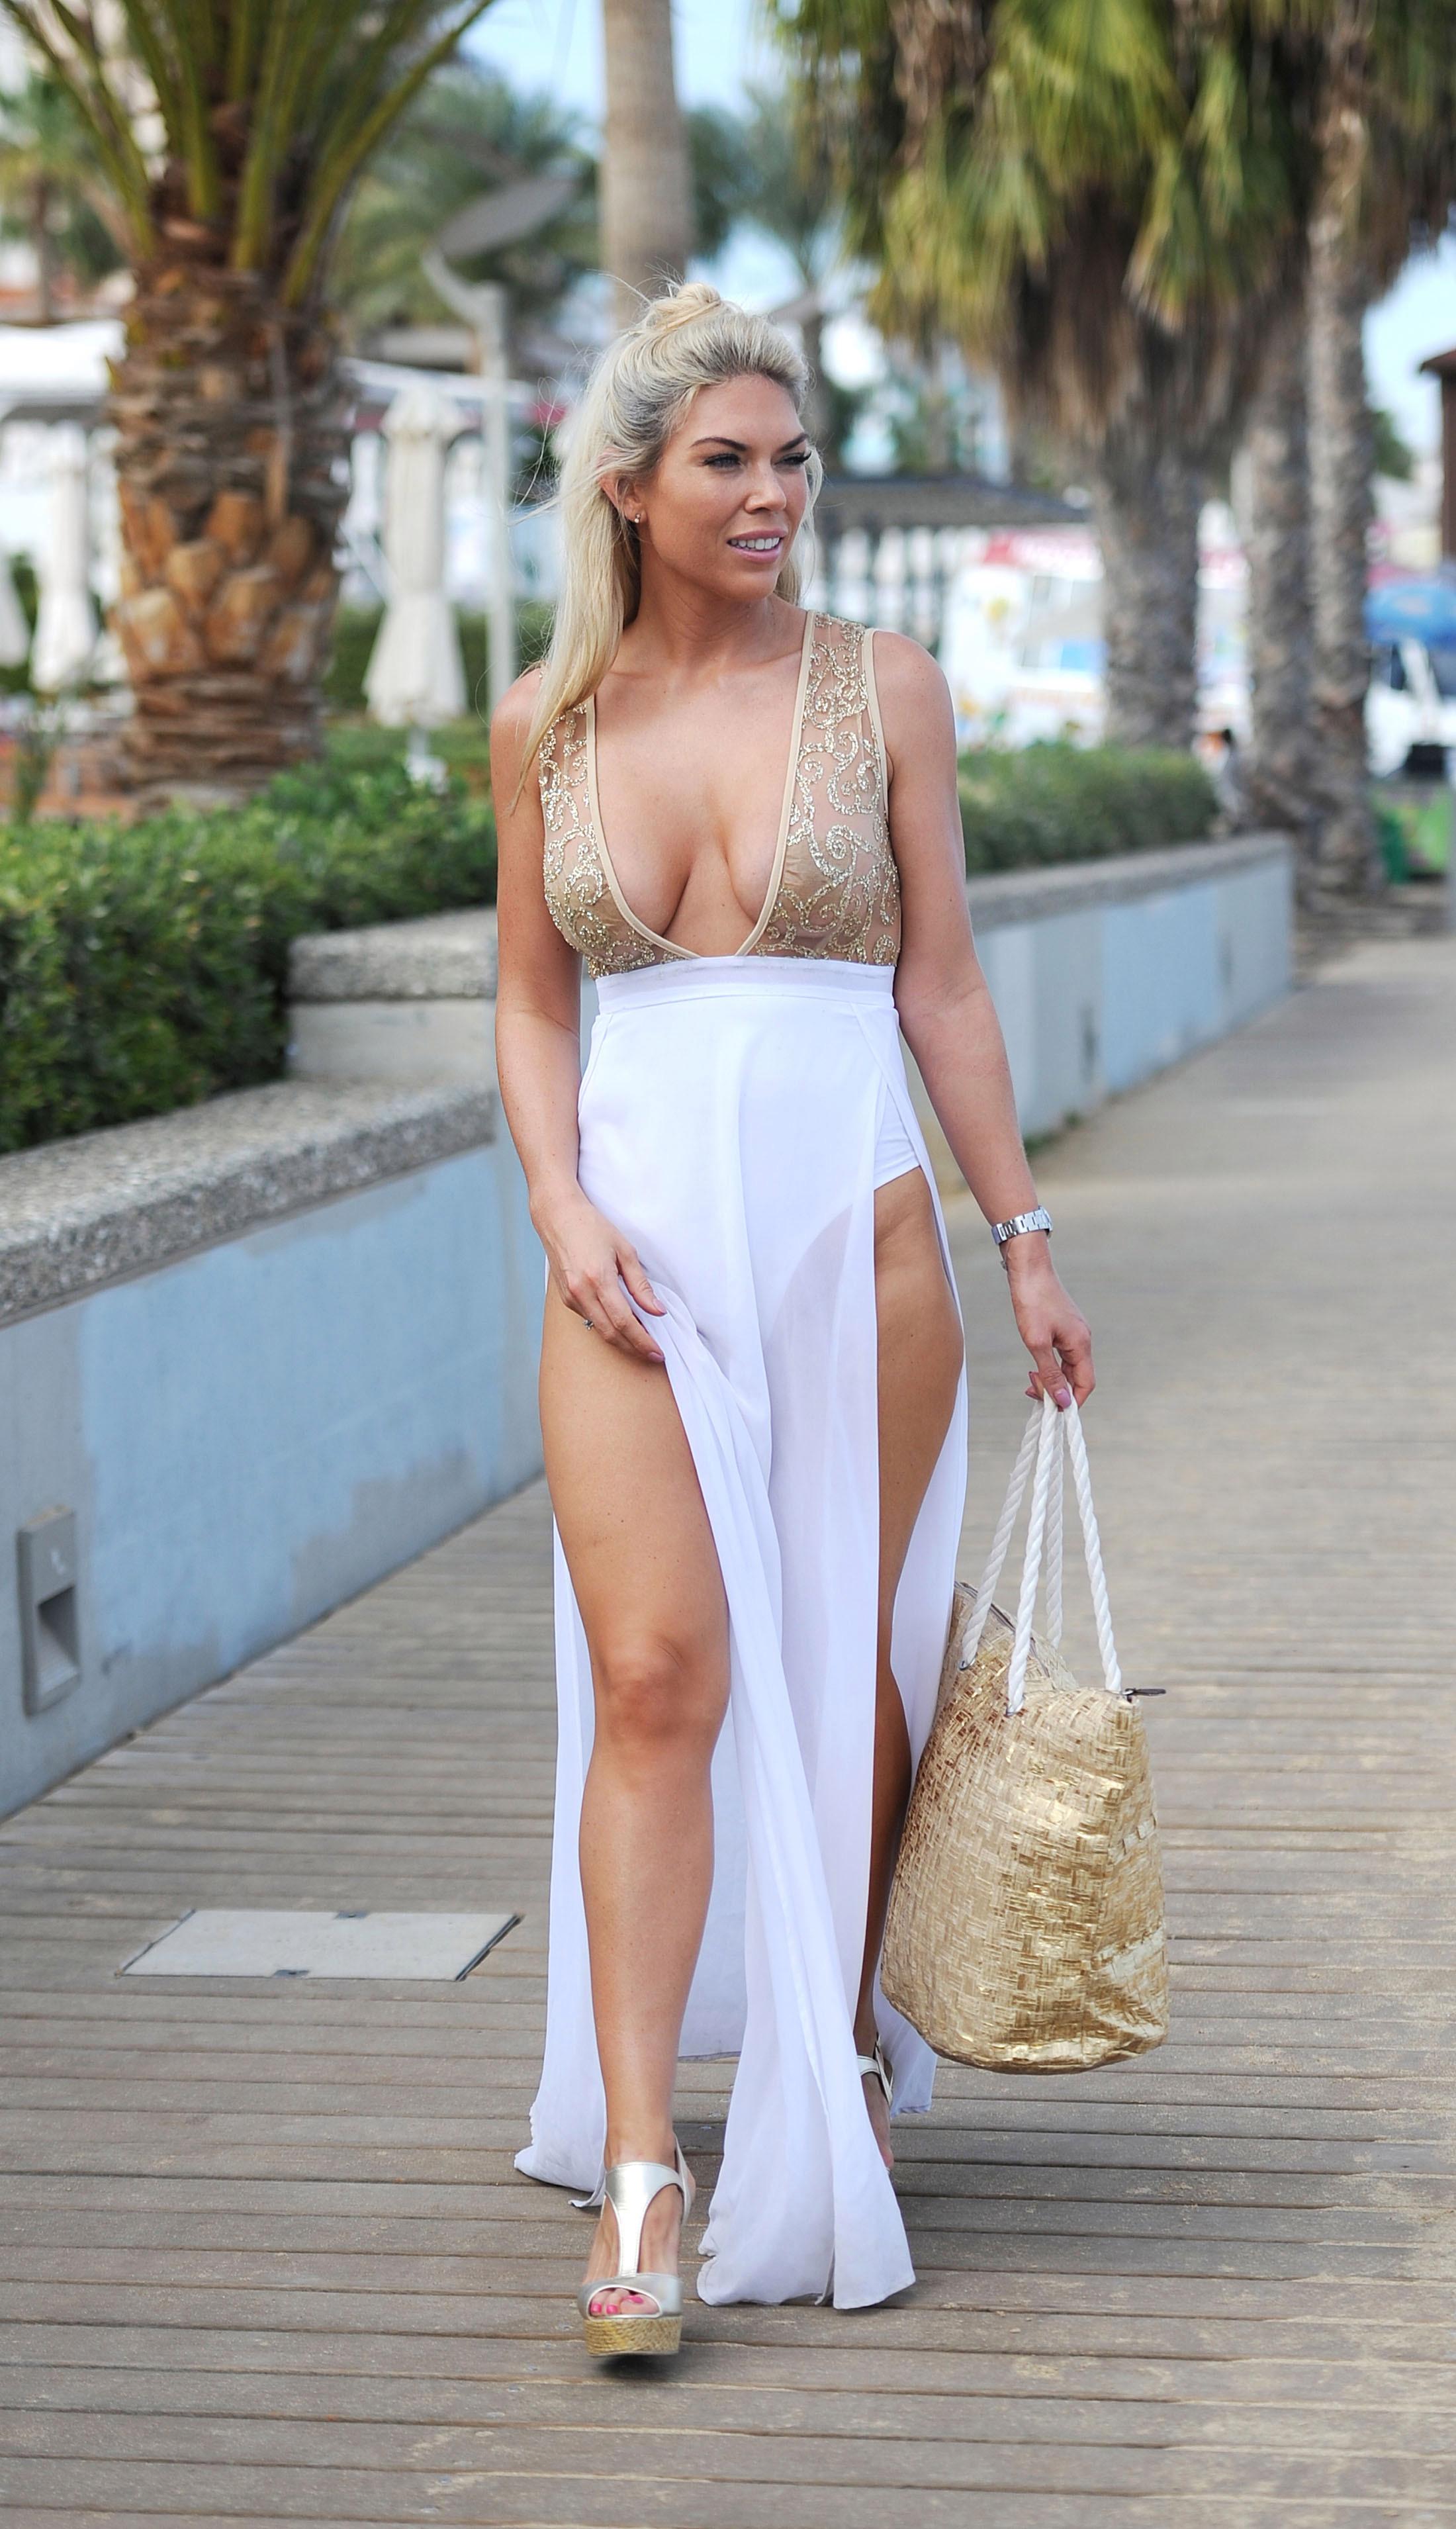 Frankie Essex boobs